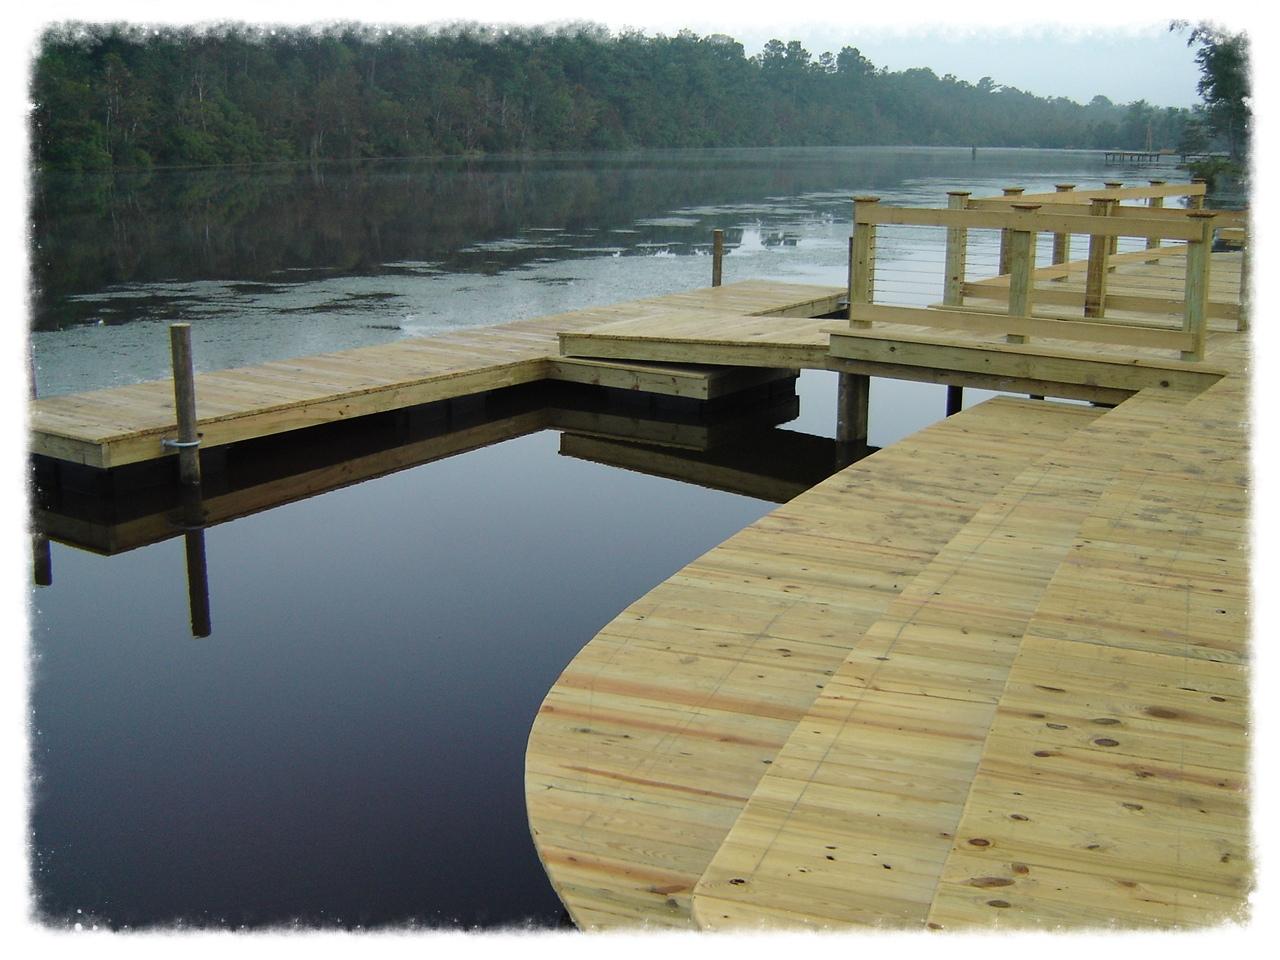 Boardwalk with Floating Dock